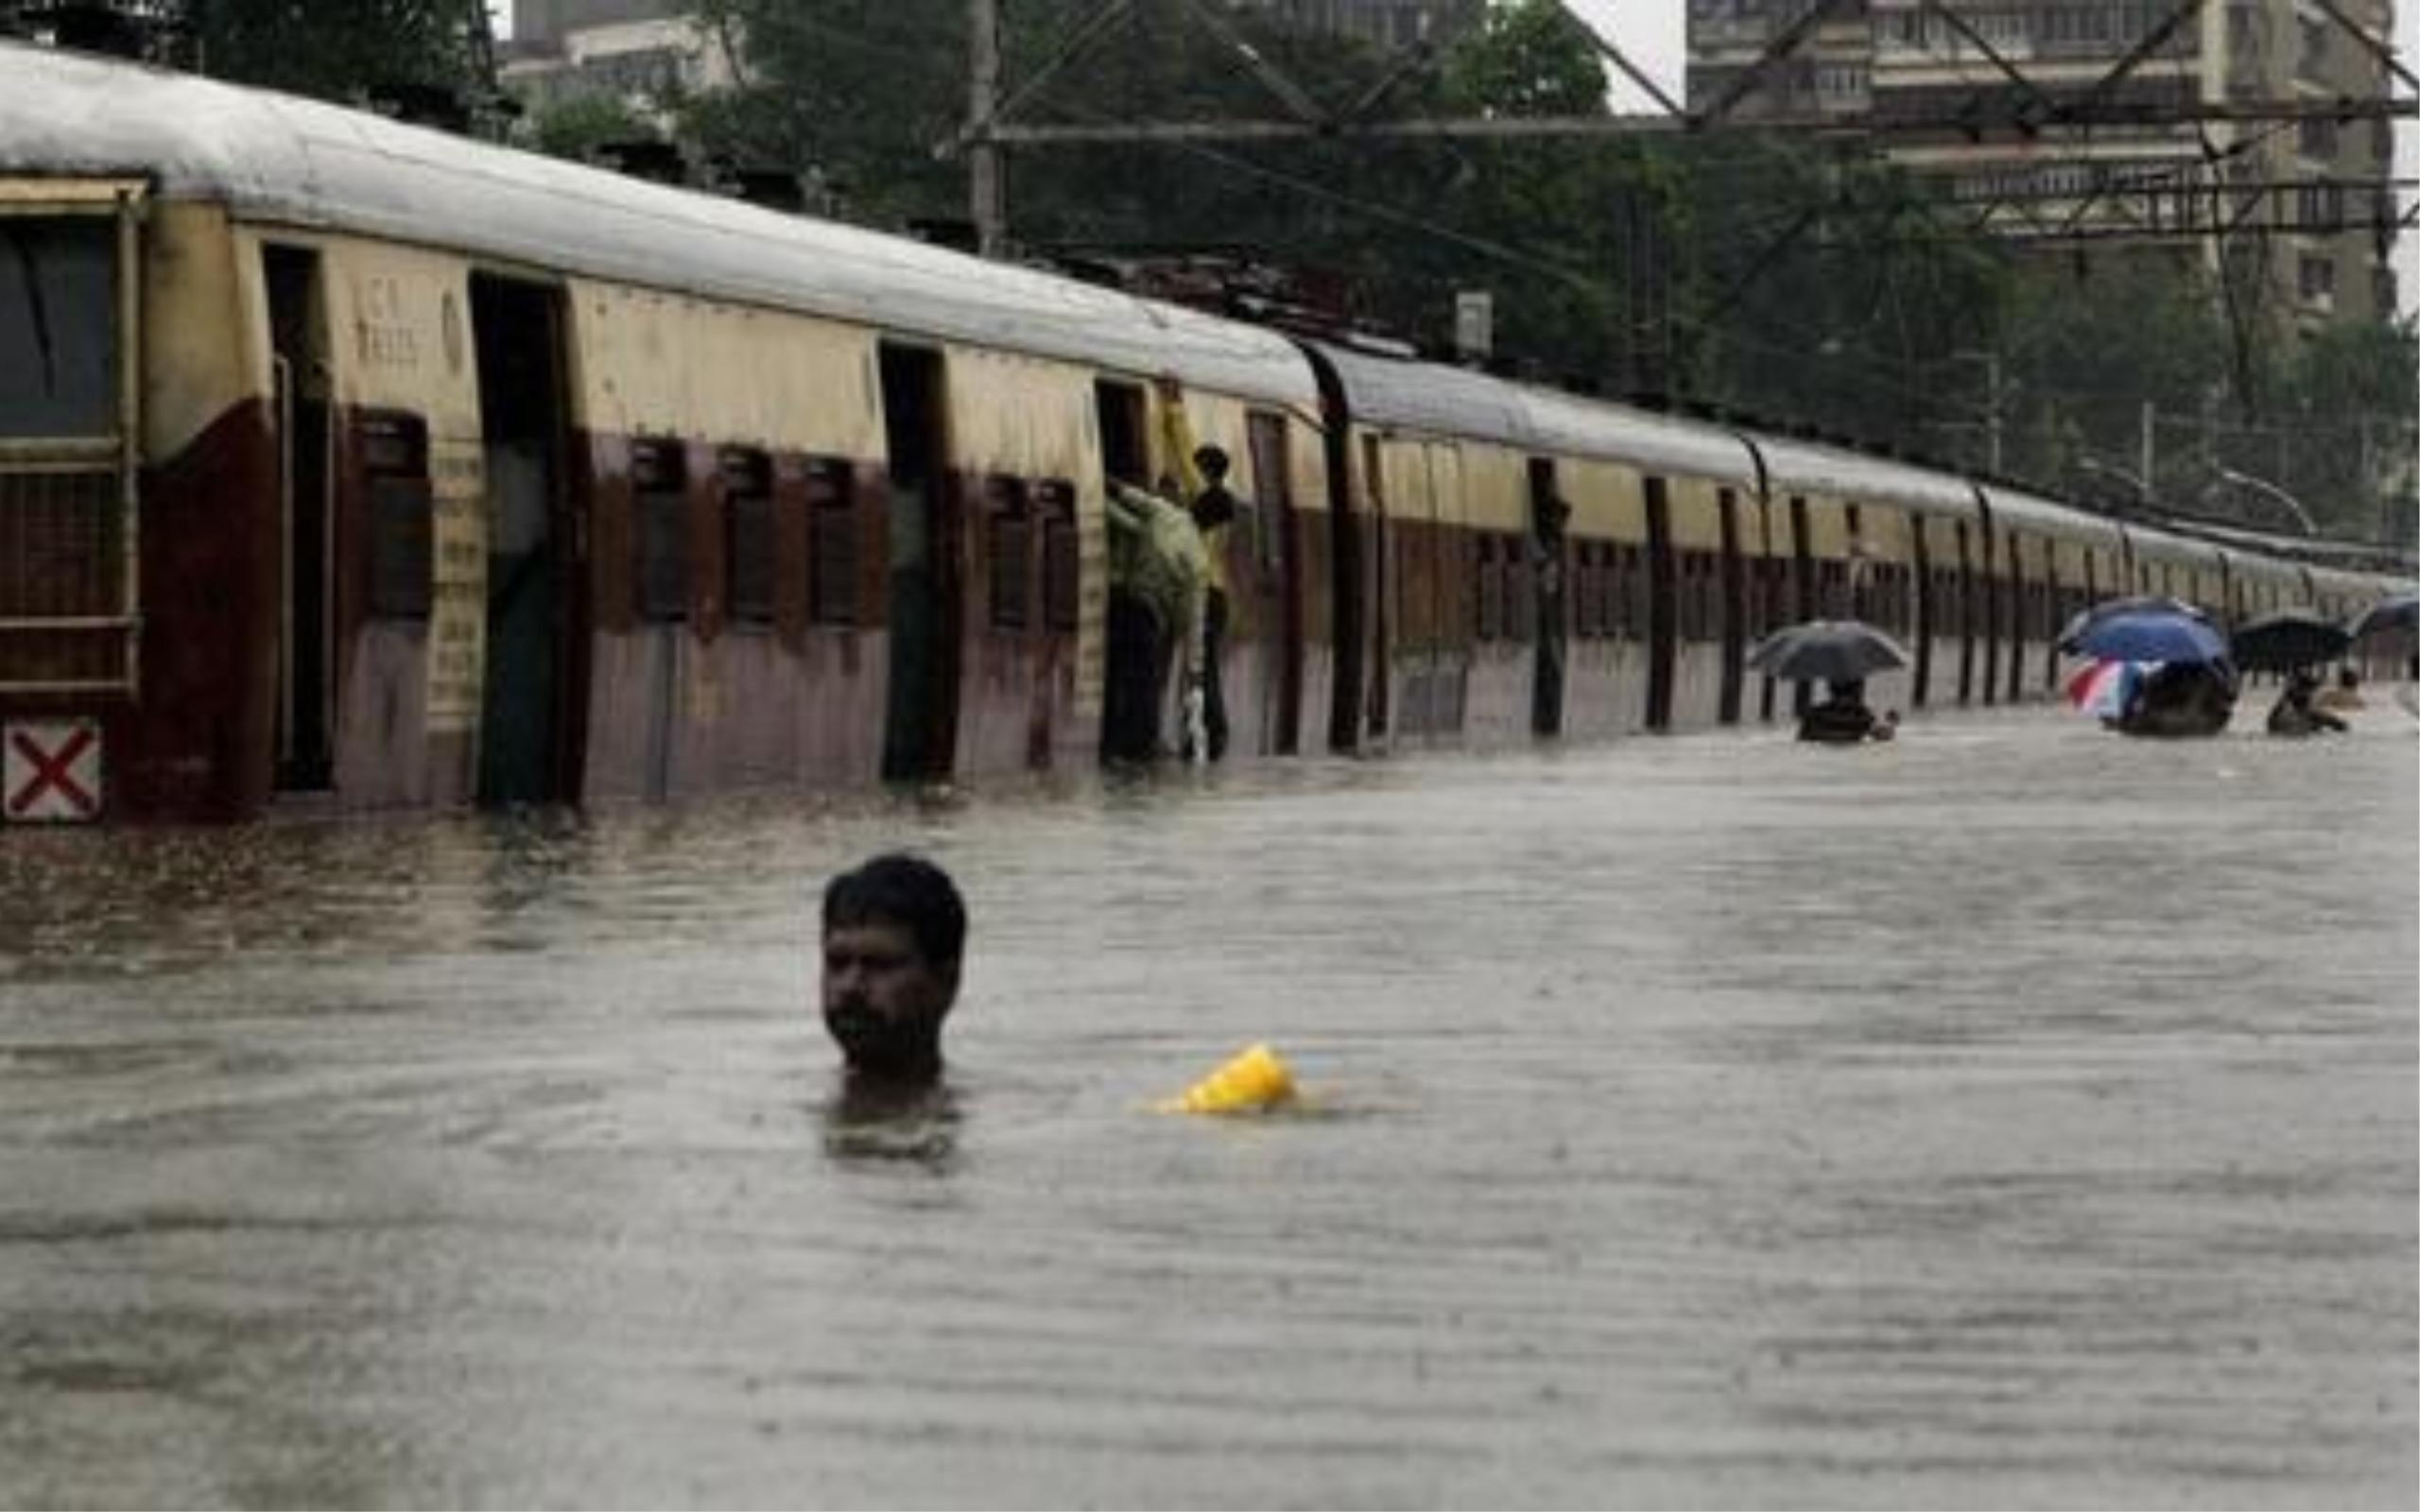 Mumbai Rains: NDRF And RPF Teams Deployed To Rescue 290 Railway Passengers